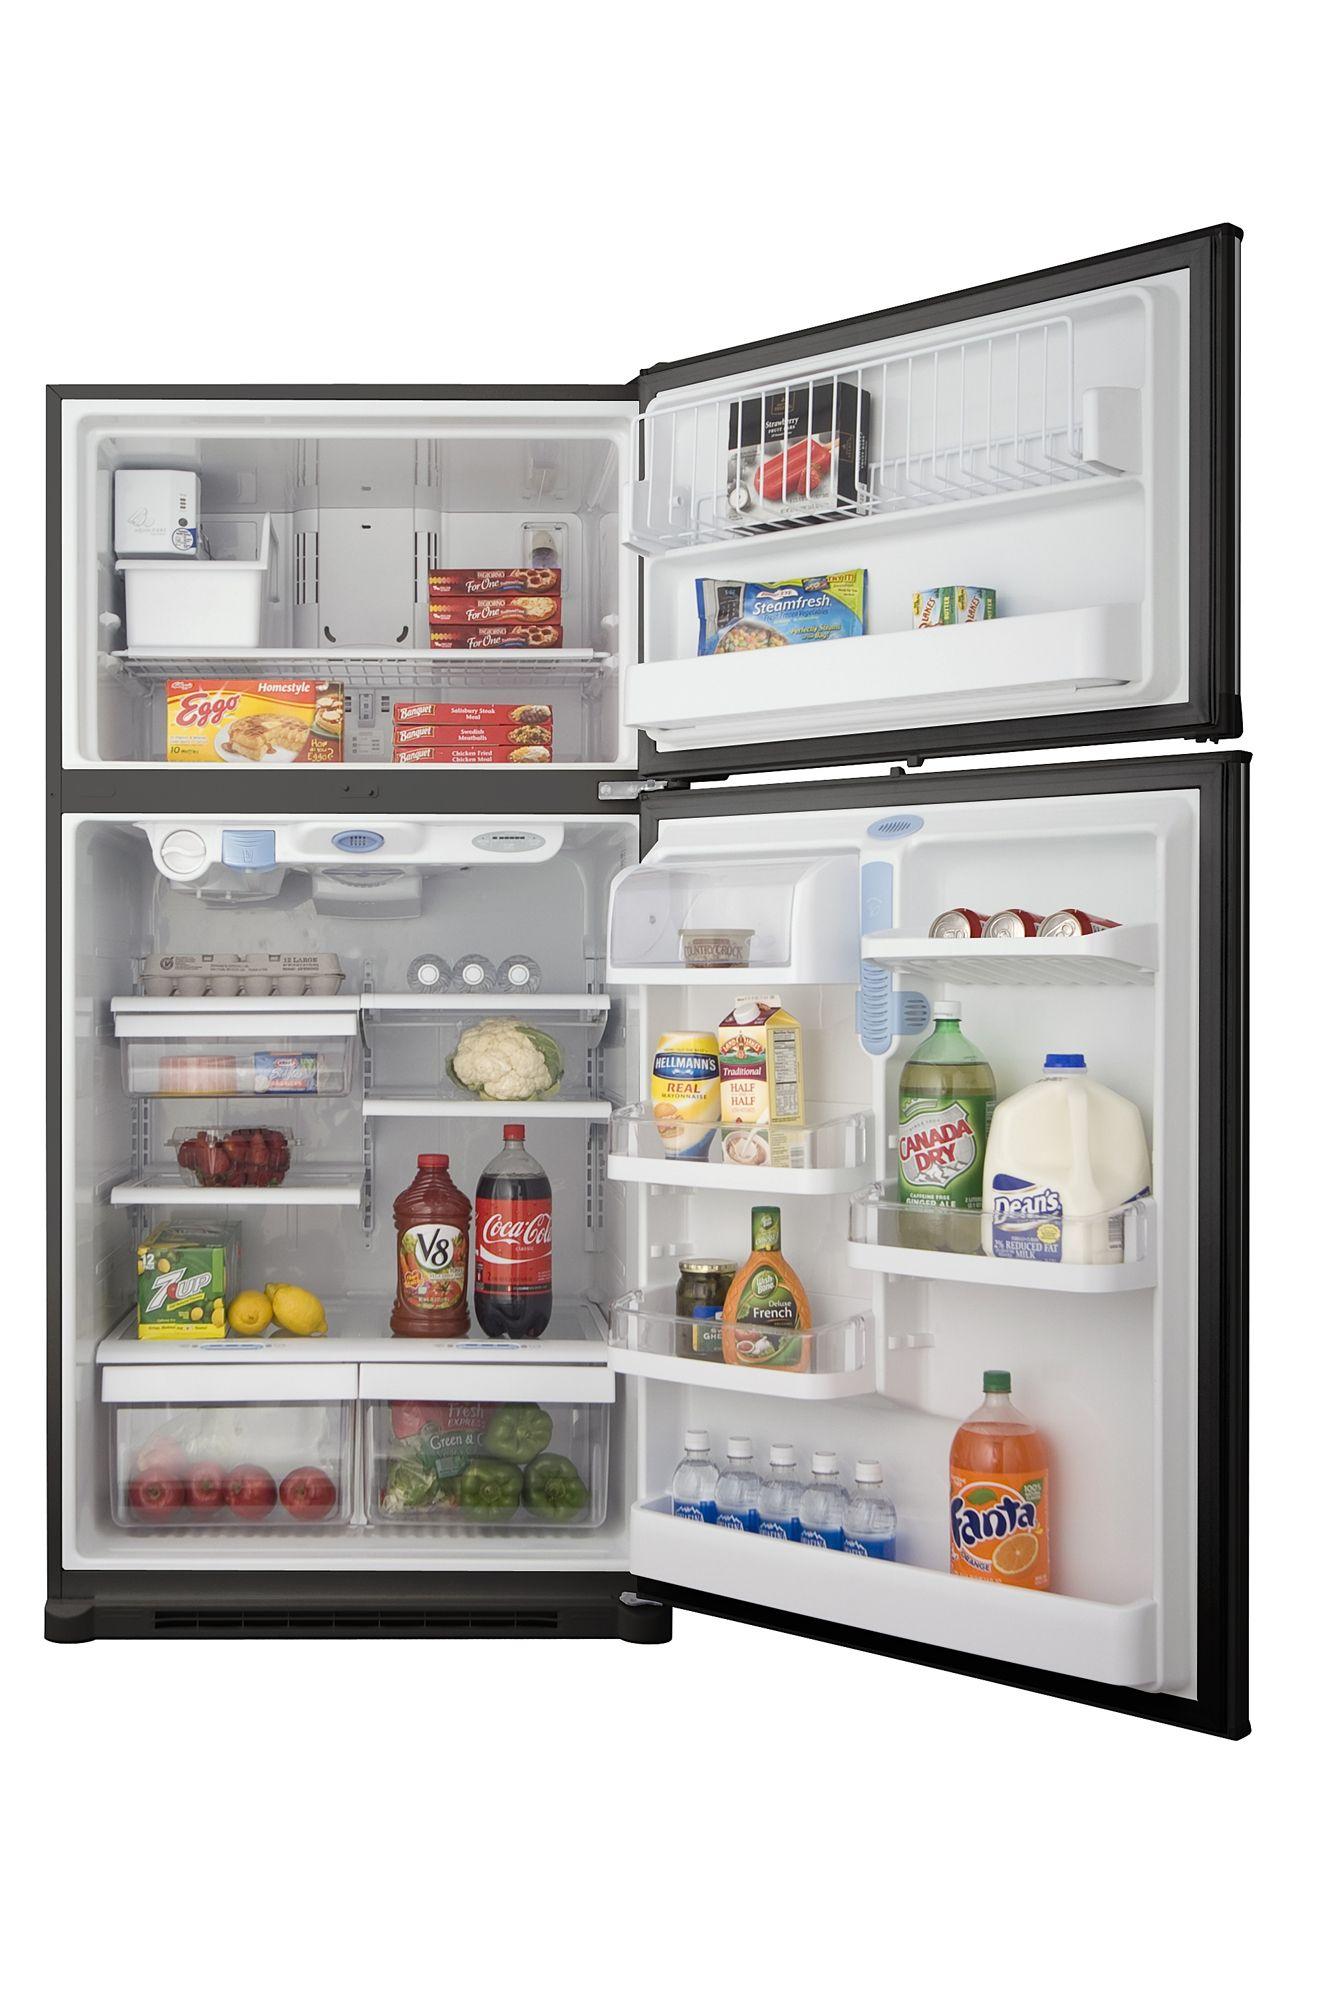 Kenmore 19.0 cu. ft. Top Freezer Refrigerator w/ Internal Water Dispenser - Black